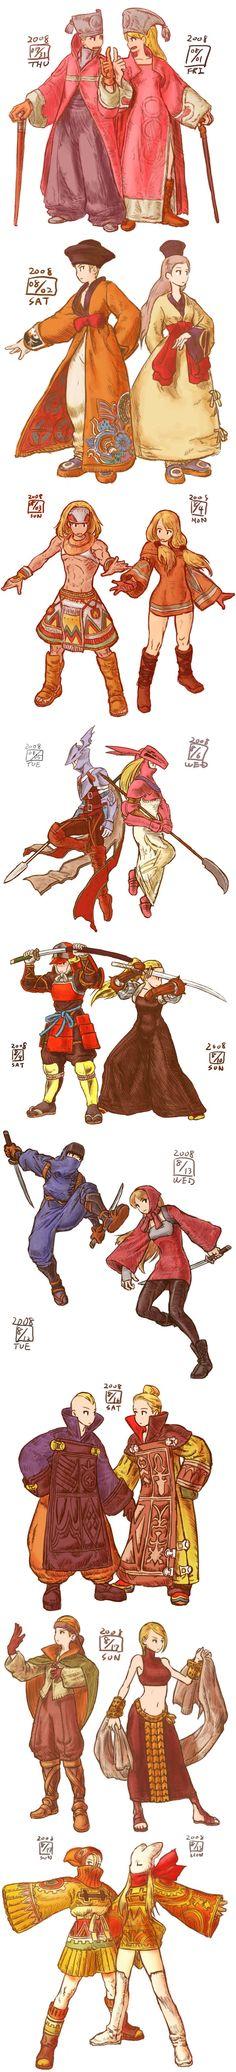 designs: mediator, oracle, geomancer, dragoon, samurai, ninja, calculator, bard, dancer, mime by ikeda